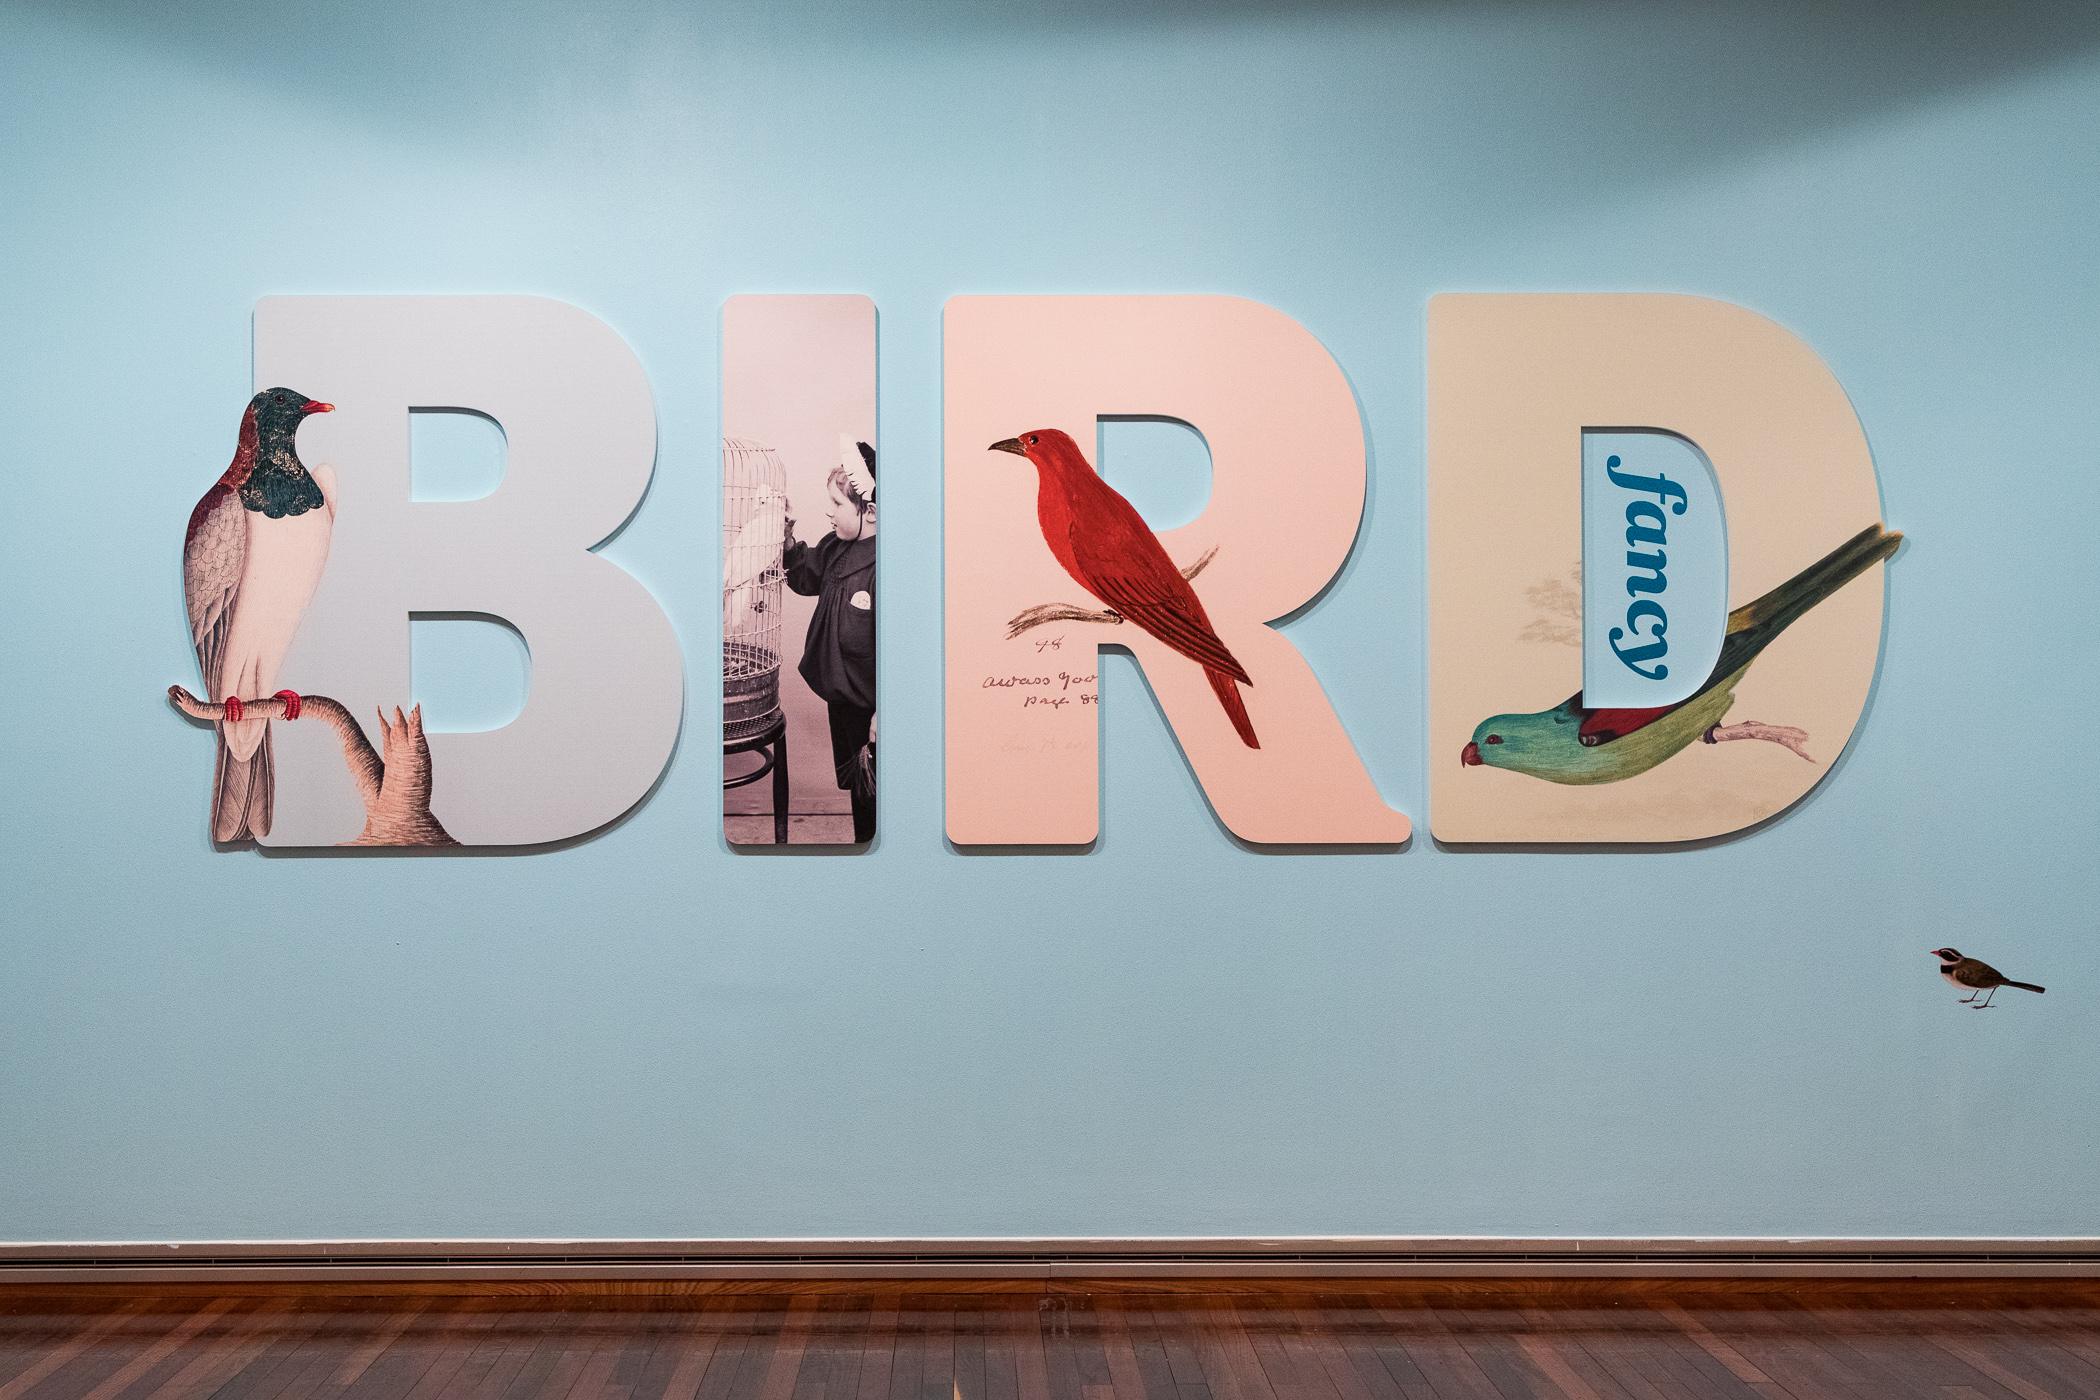 20190410_NL_PE_TPFG_Bird_Fancy_opening_005.jpg